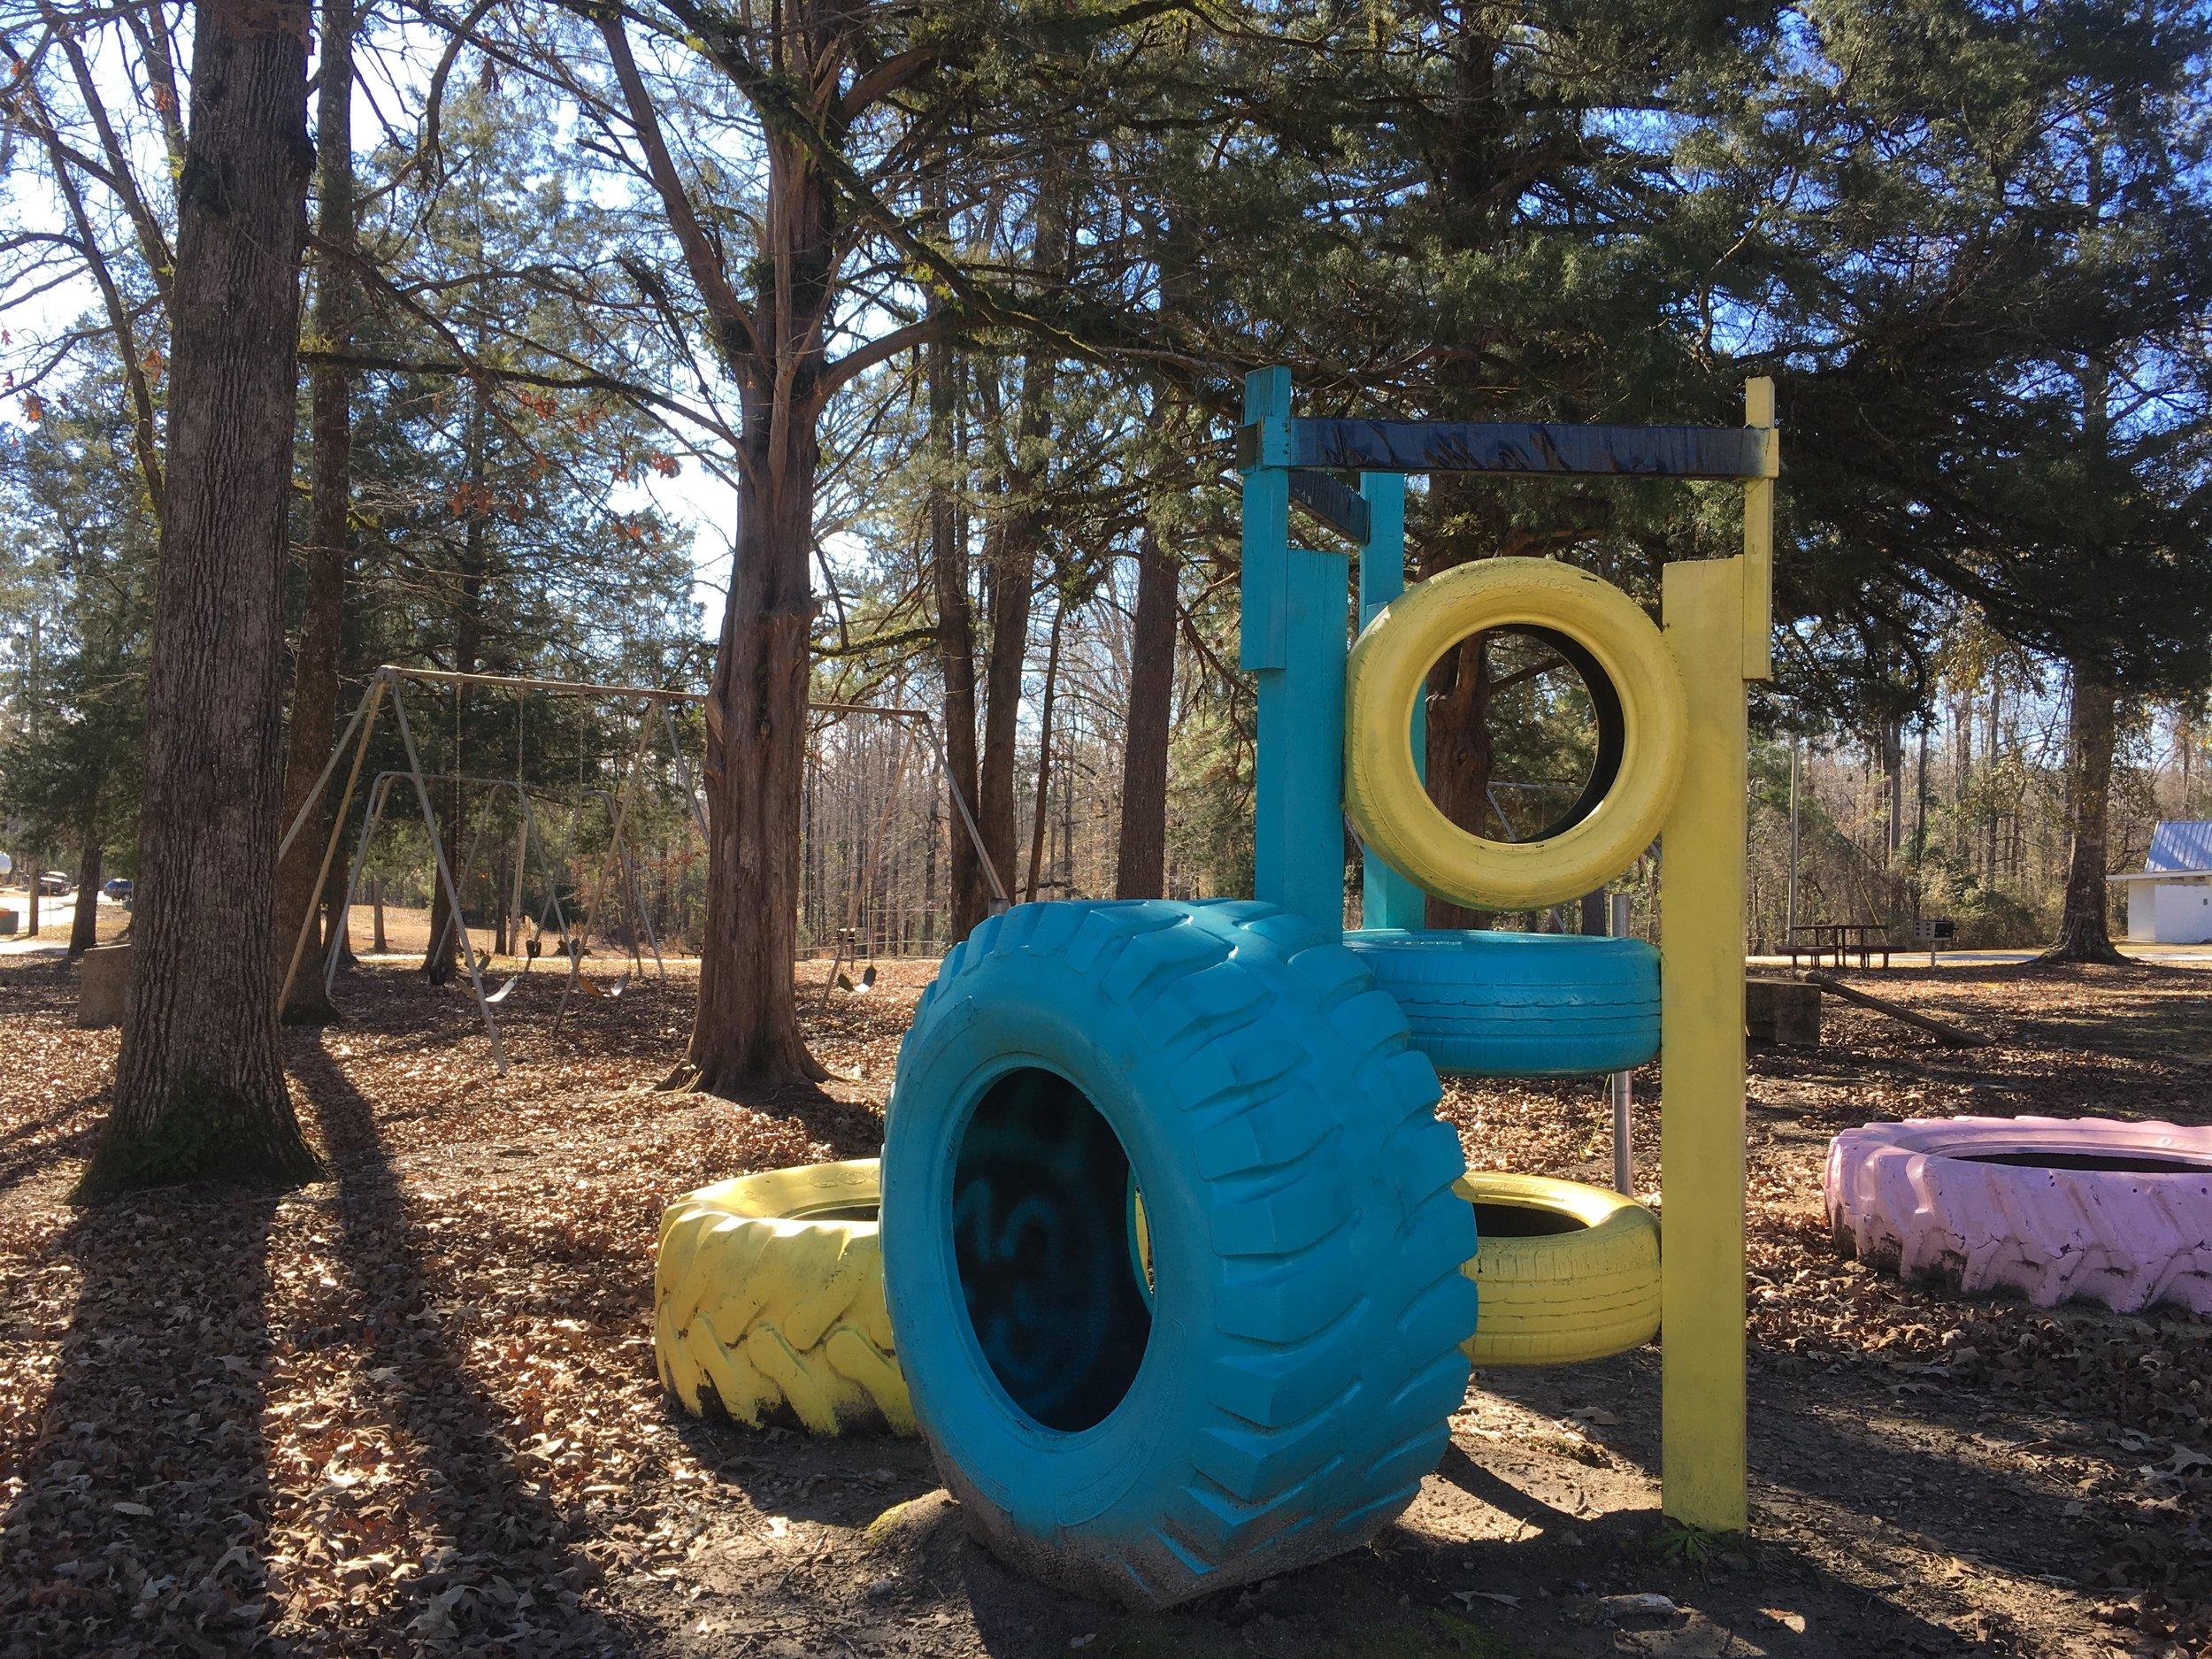 Playground, December 24, 2018